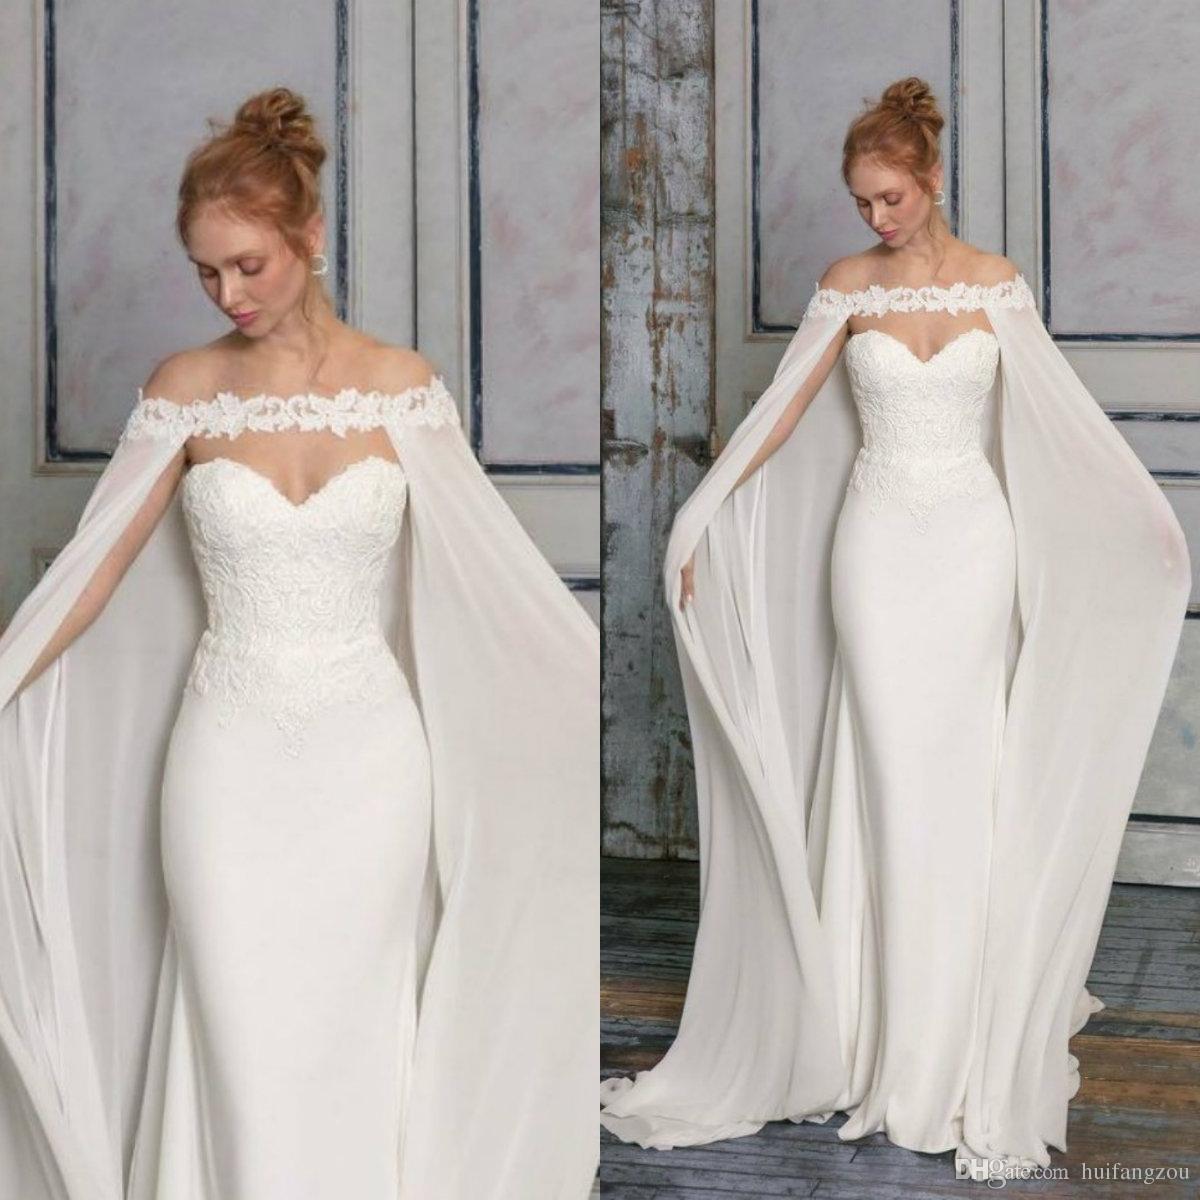 2019 Lace Applique Bridal Jackets Custom Made Cheap Long Chiffon Wedding Cape Shawls Wraps for Formal Dresses